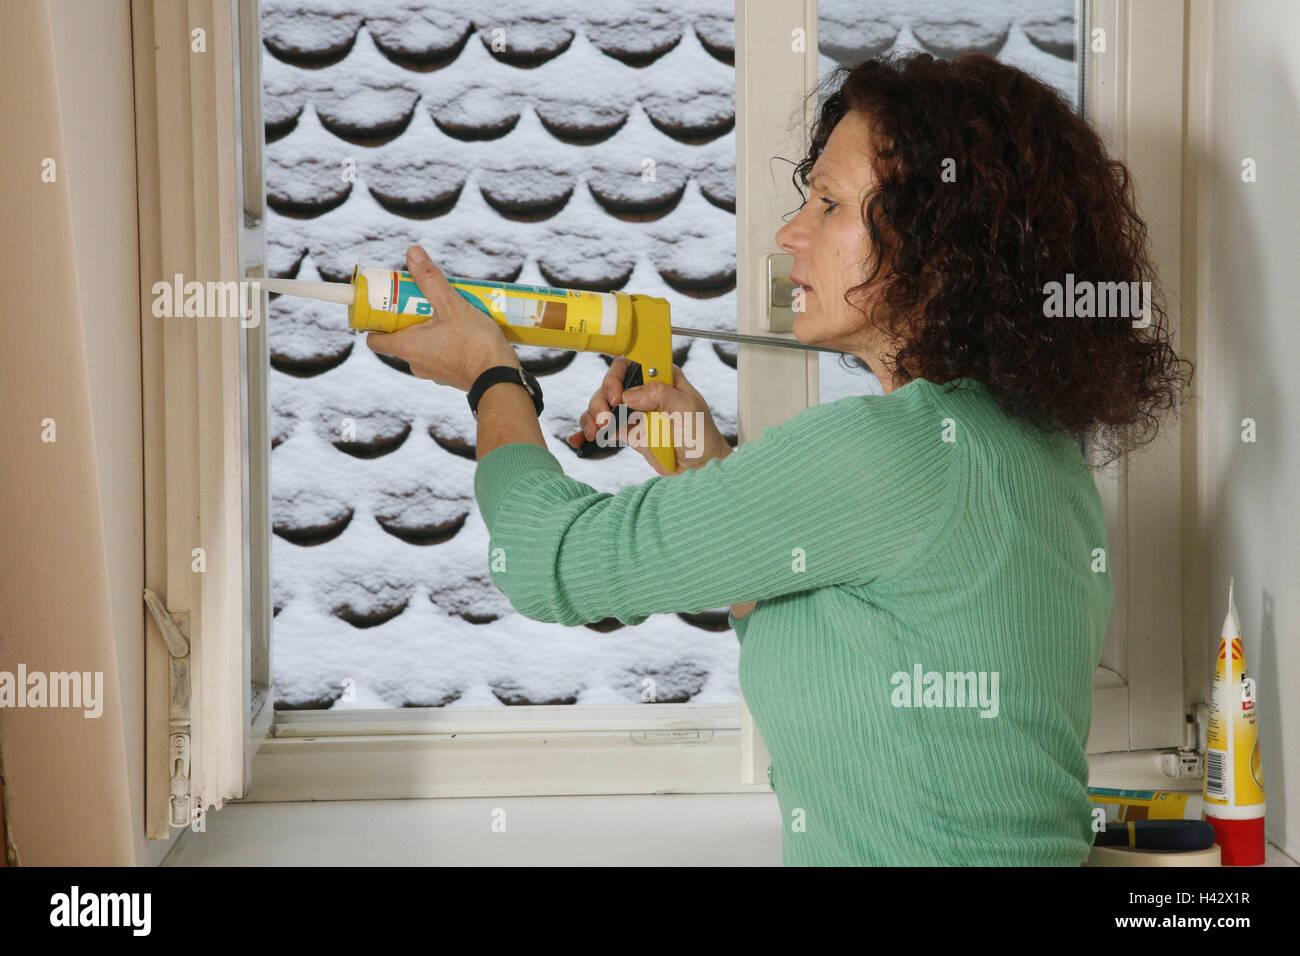 Frau Silikon Spritze Fensterrahmen Dichtung Model Release